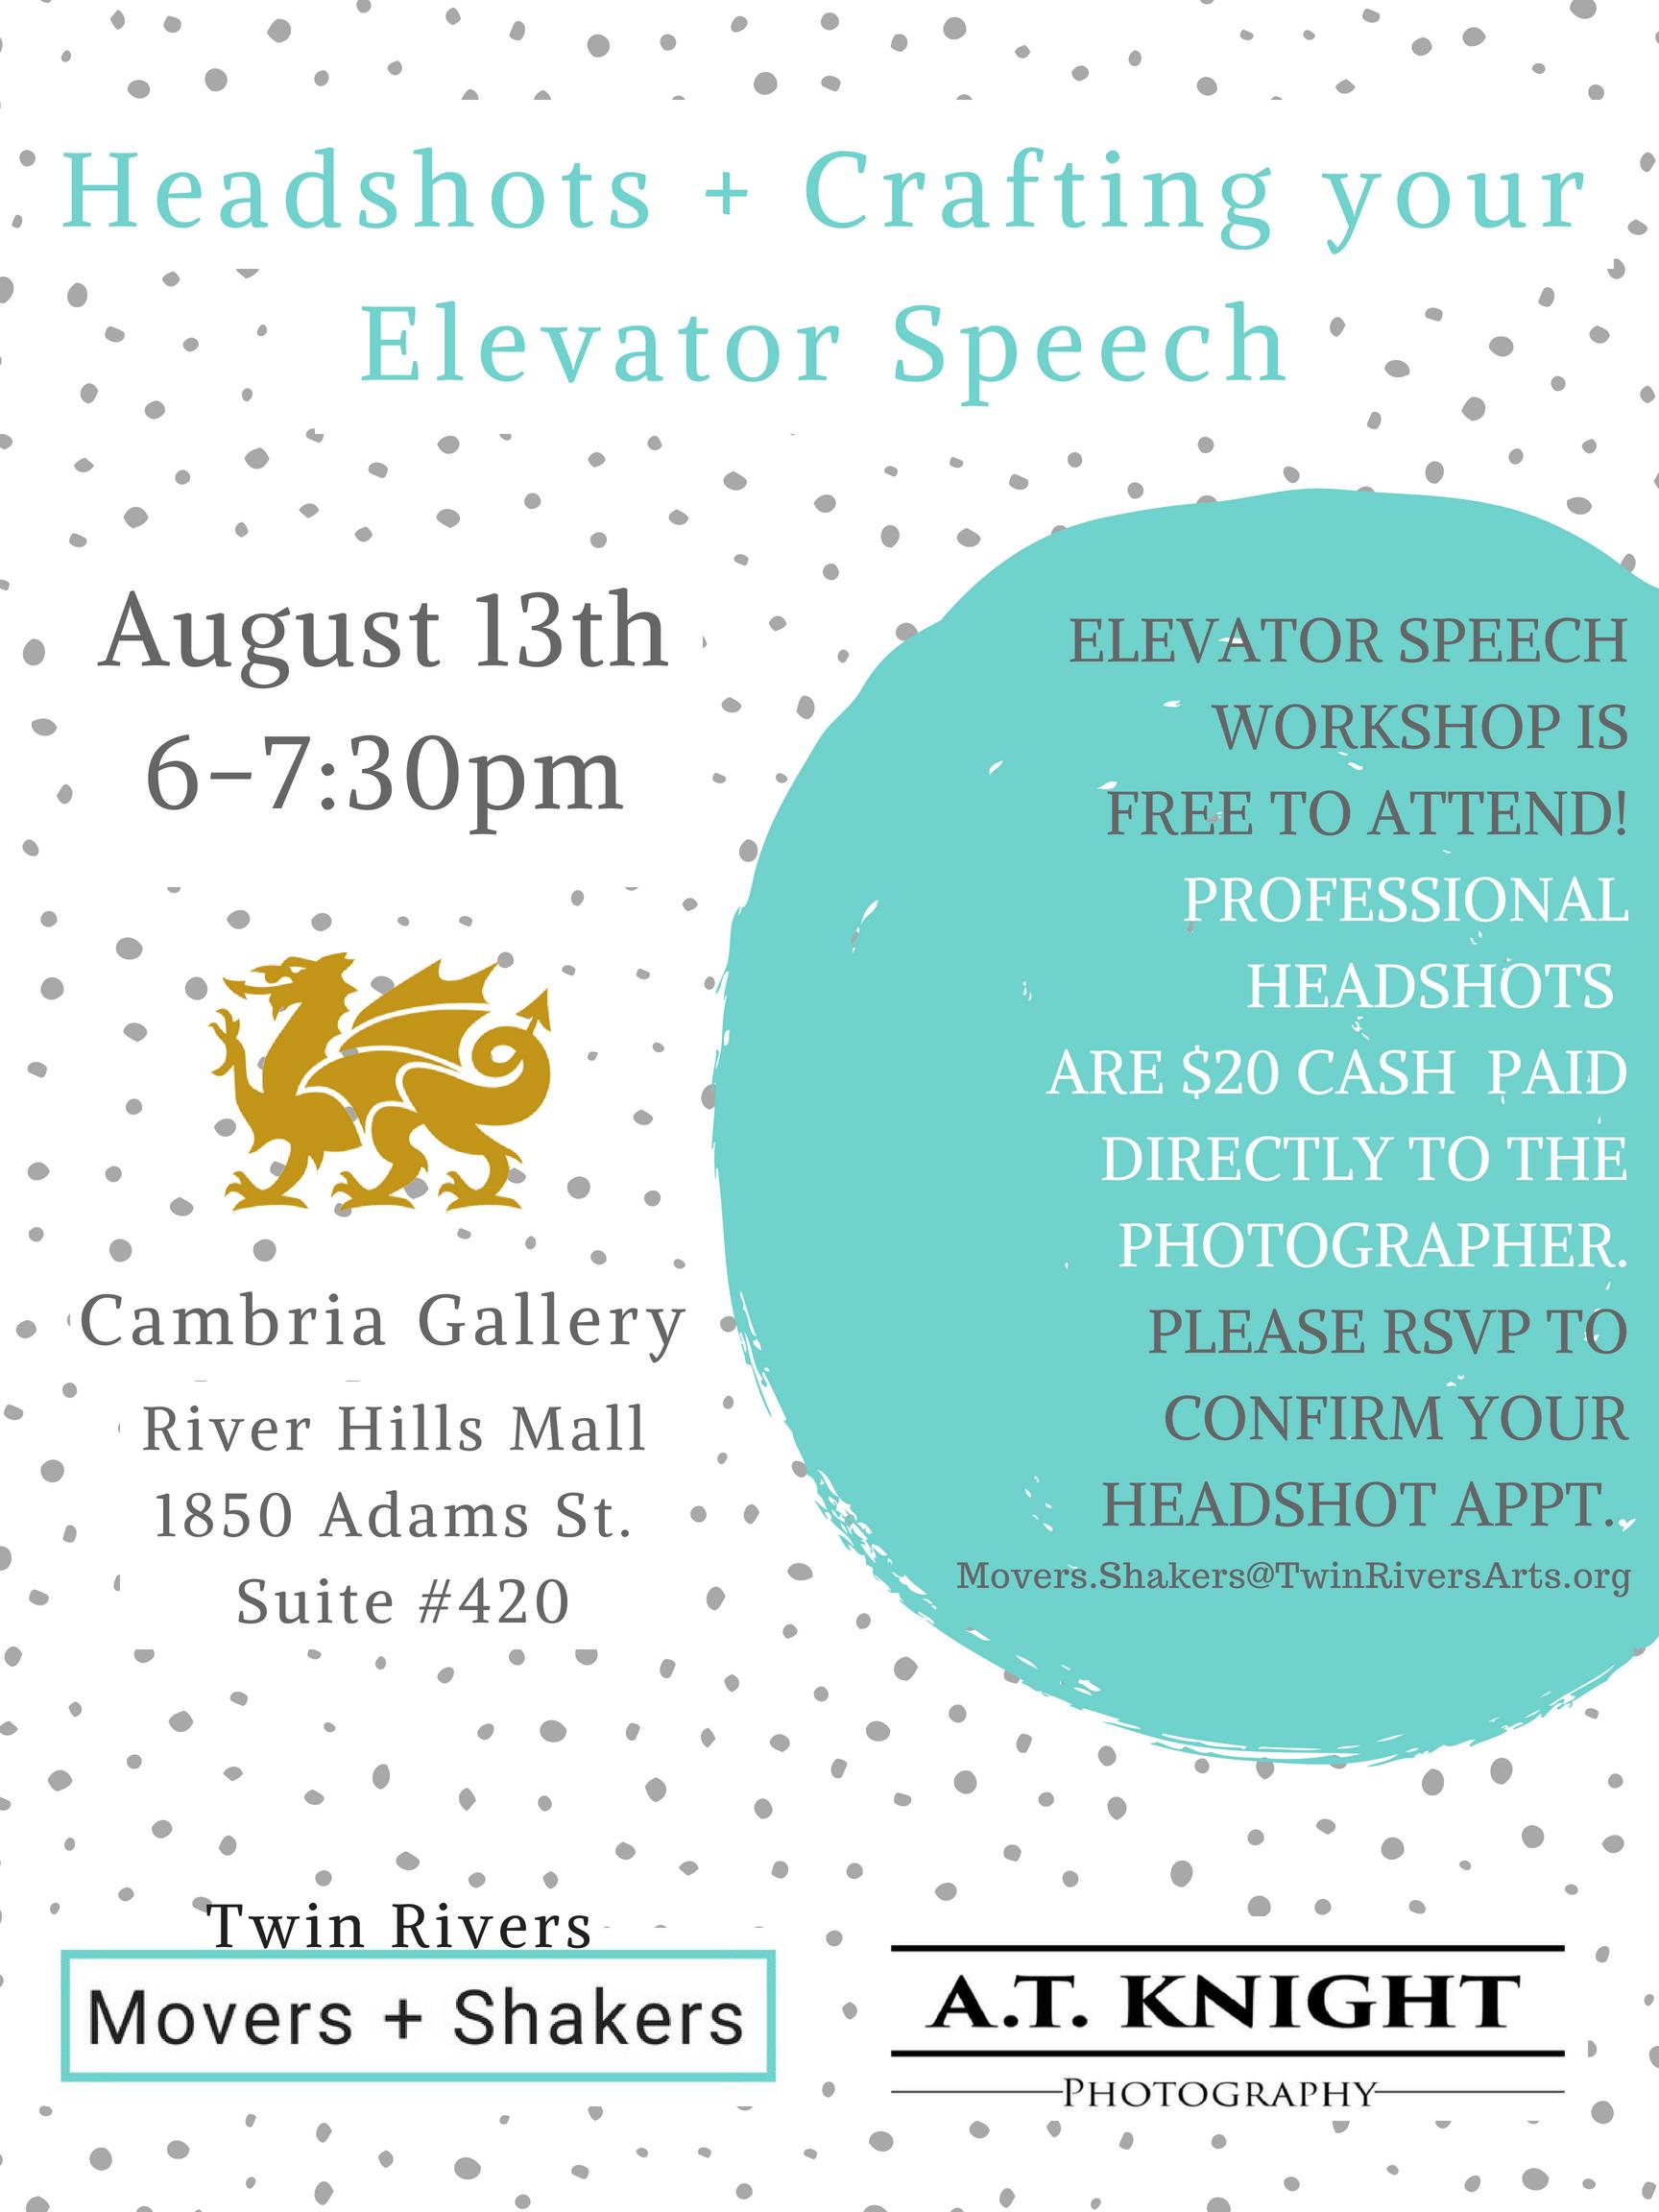 Headshots + Crafting Your Elevator Speech (1).jpg